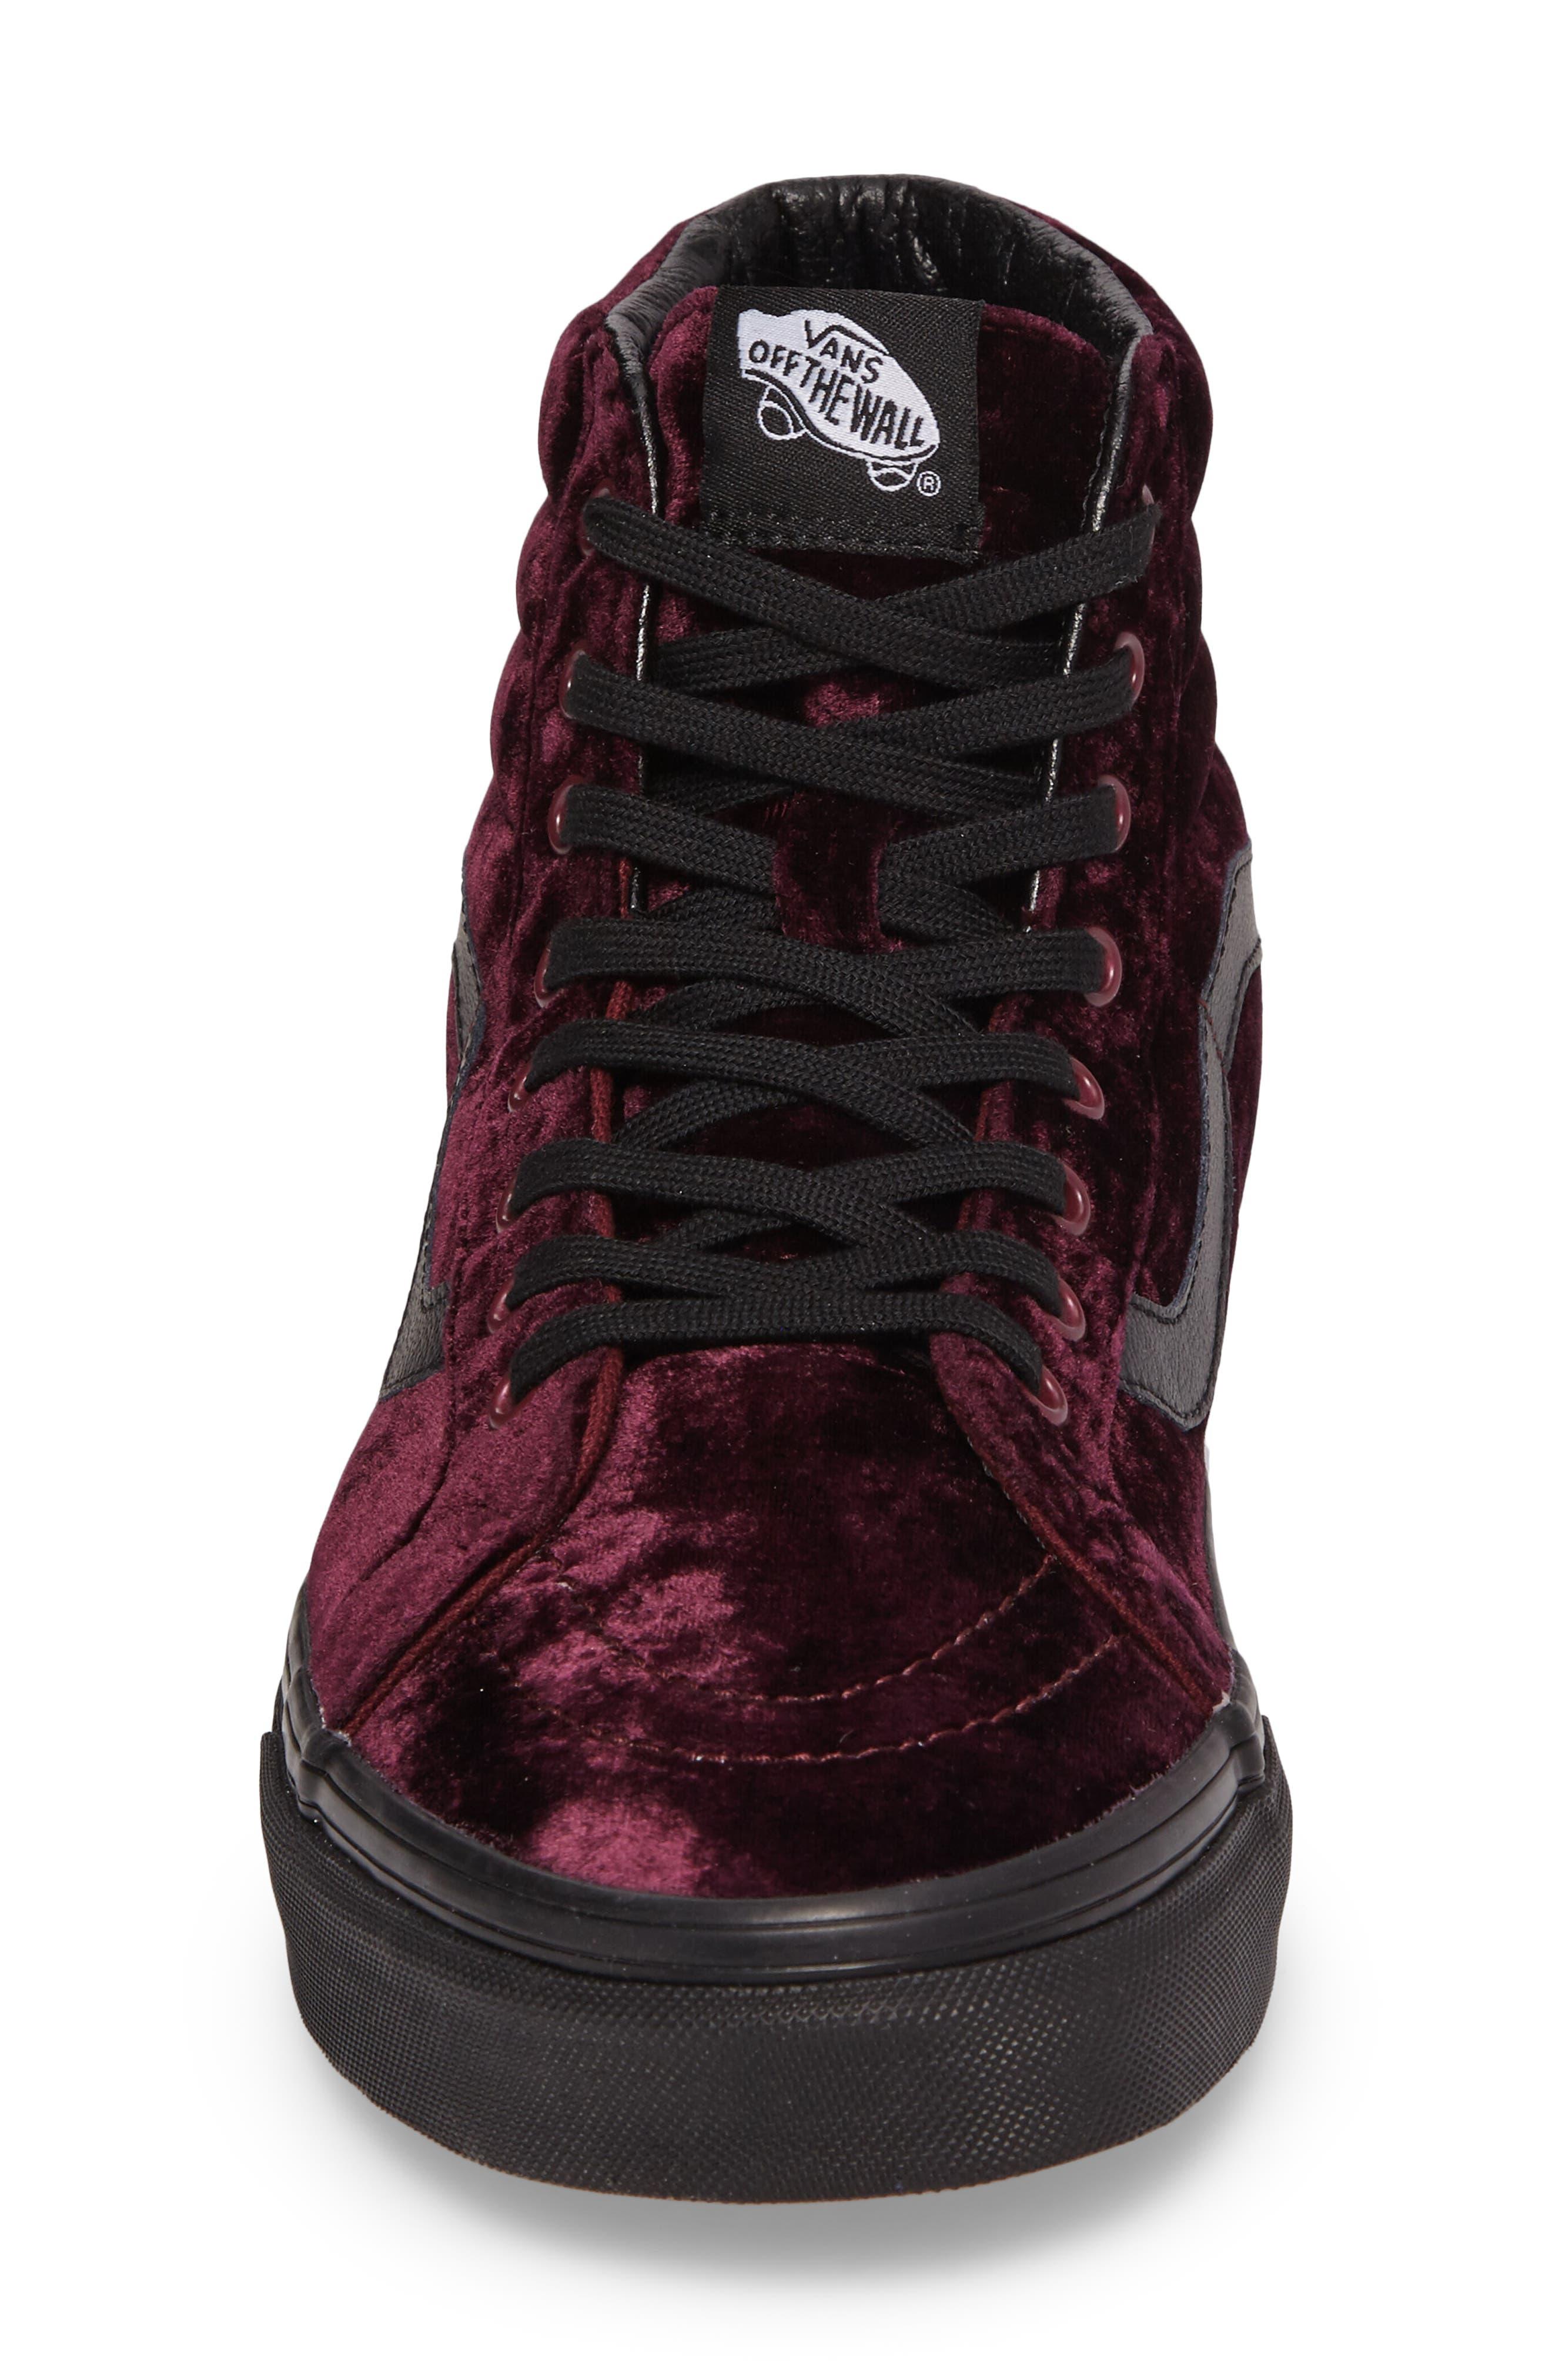 SK8-Hi Reissue High Top Sneaker,                             Alternate thumbnail 4, color,                             930